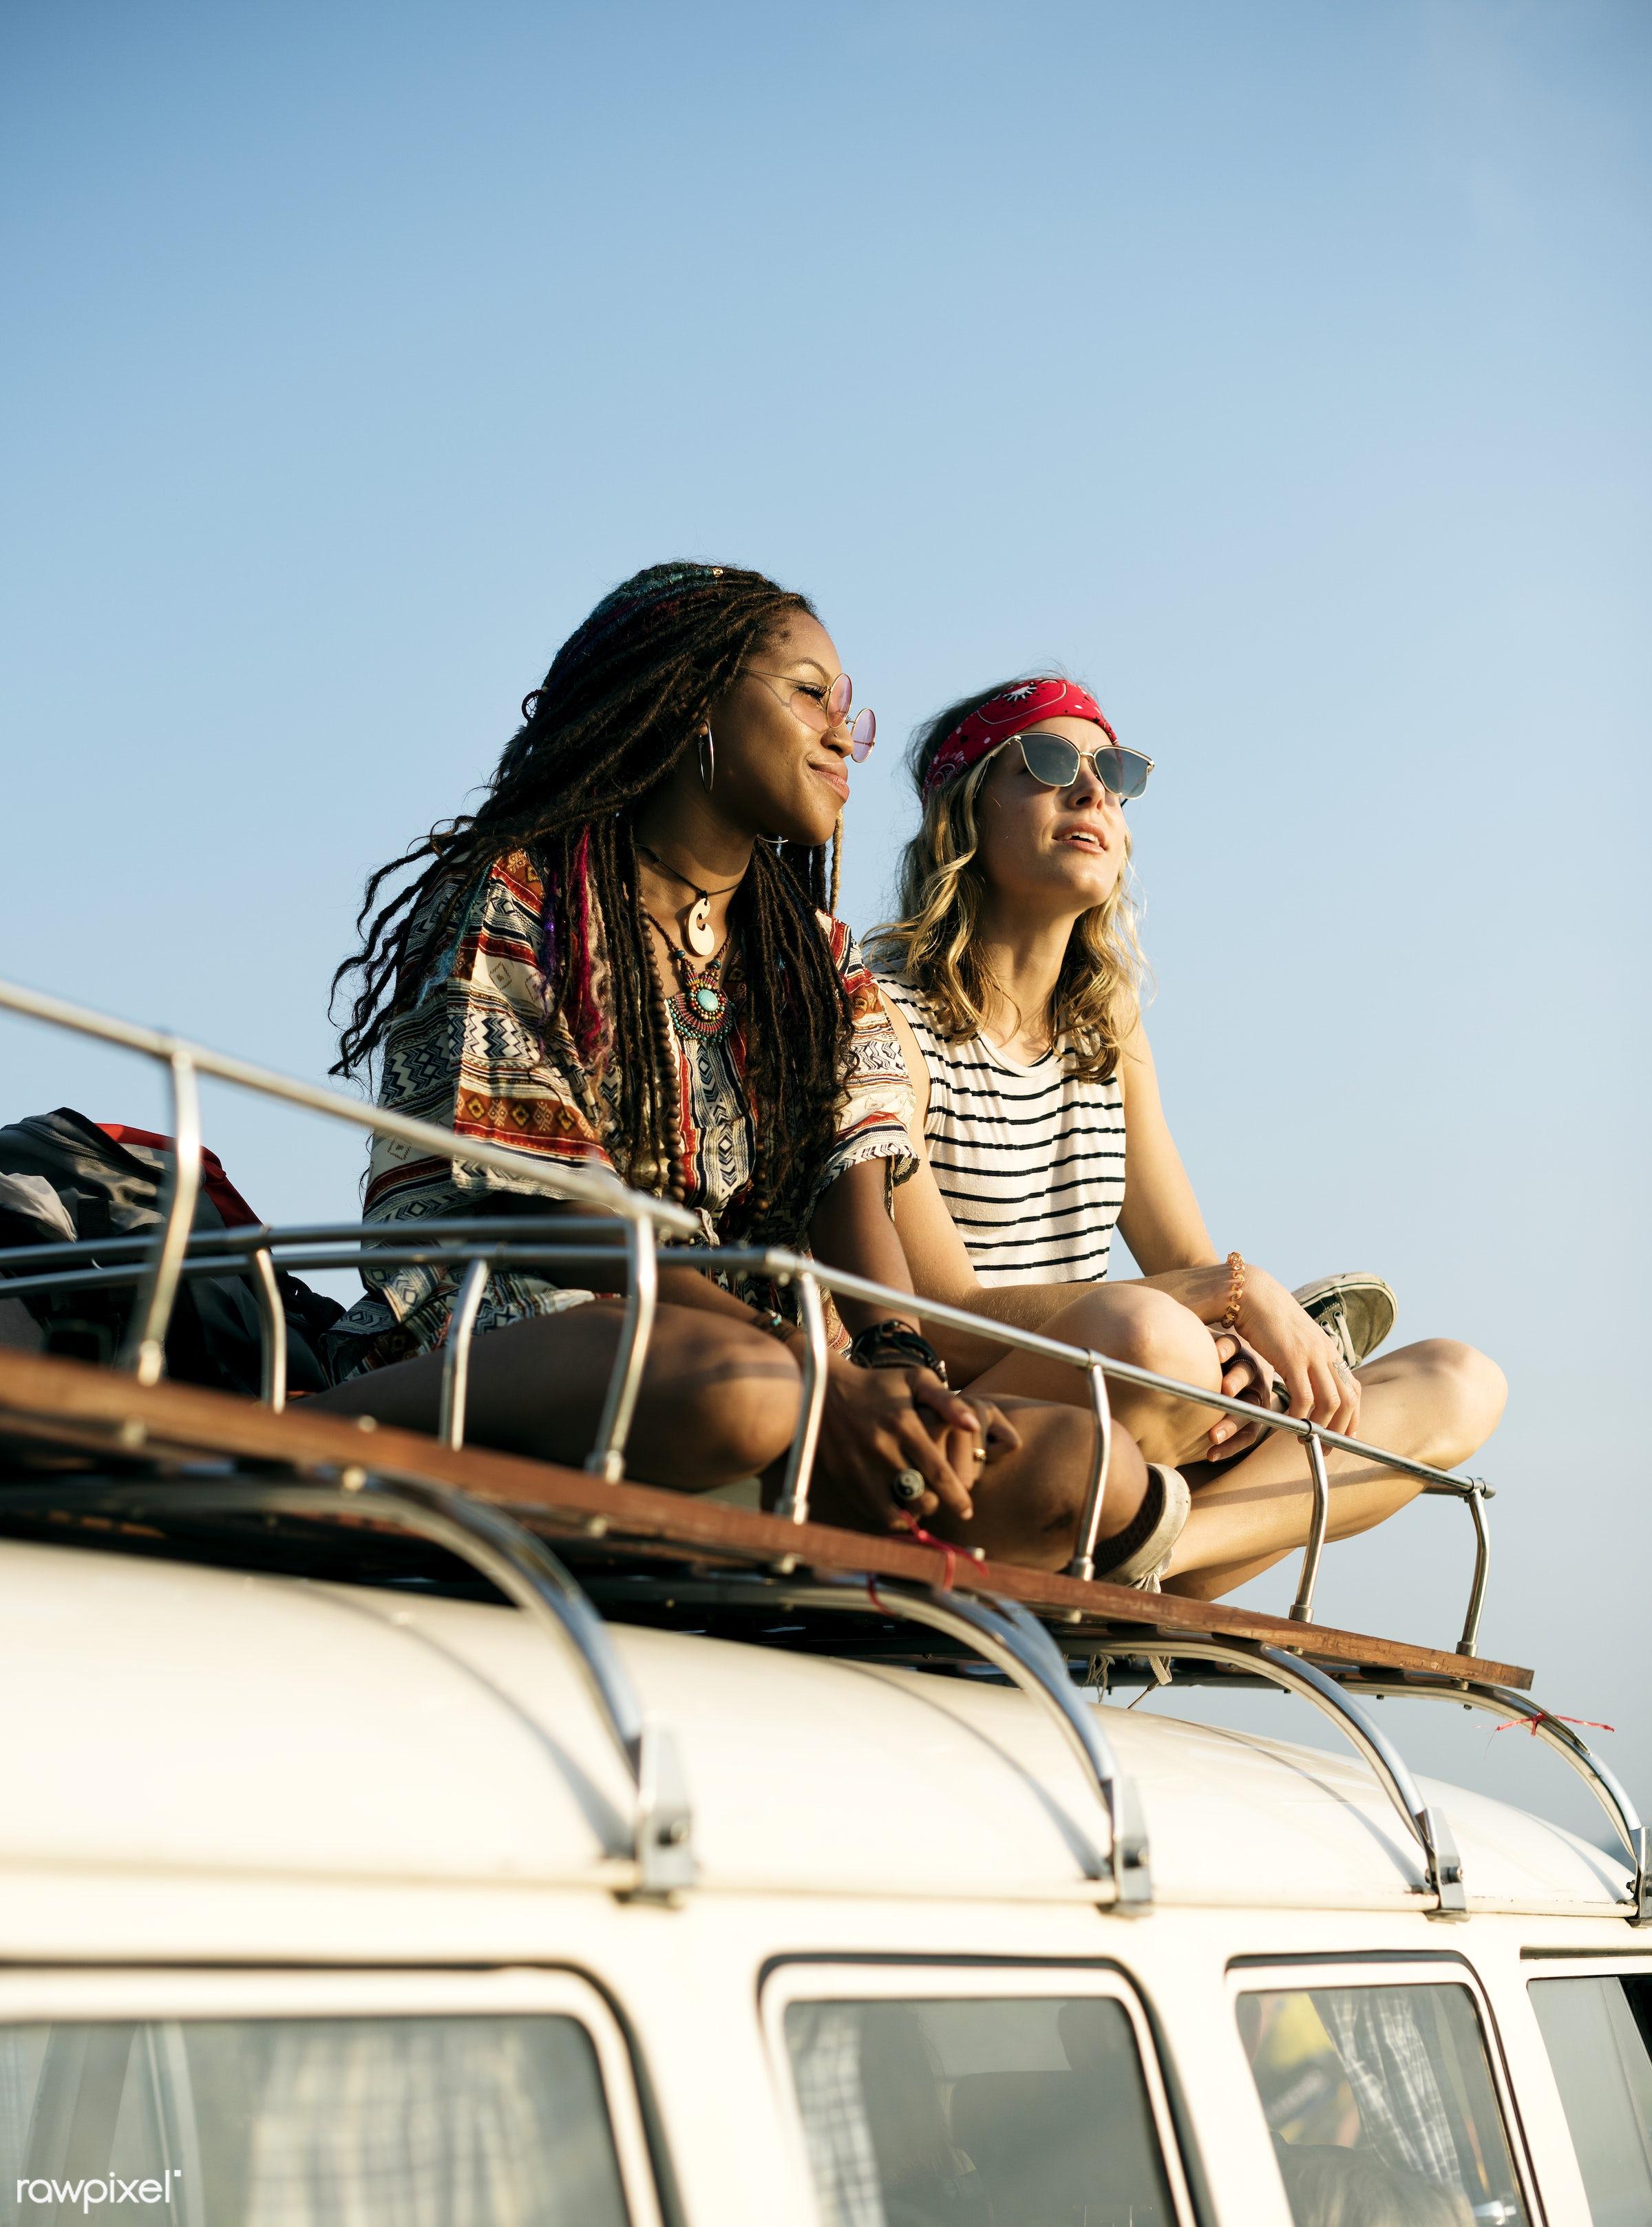 van, adult, adventure, diversity, enjoy, enjoyment, female, friends, friendship, fun, group, happiness, happy, hippy,...